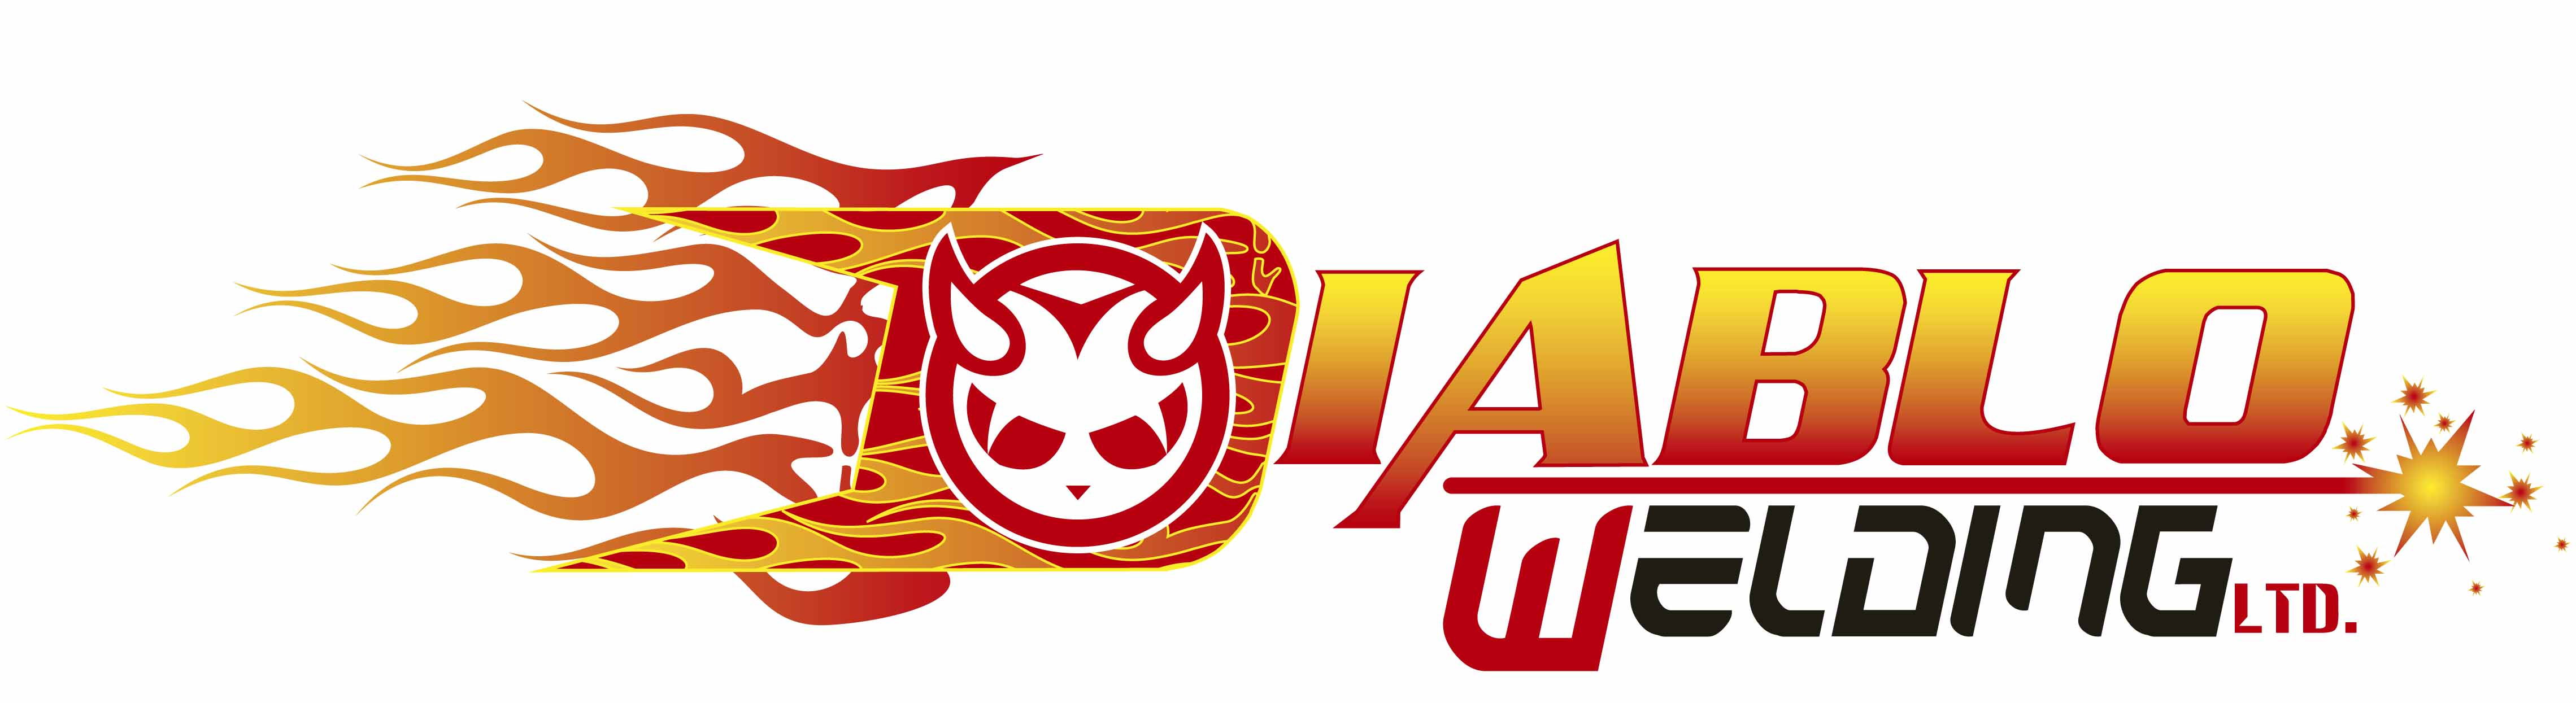 Logo Design by Jonathan Rasonable - Entry No. 41 in the Logo Design Contest New Logo Design for Diablo Welding Ltd..